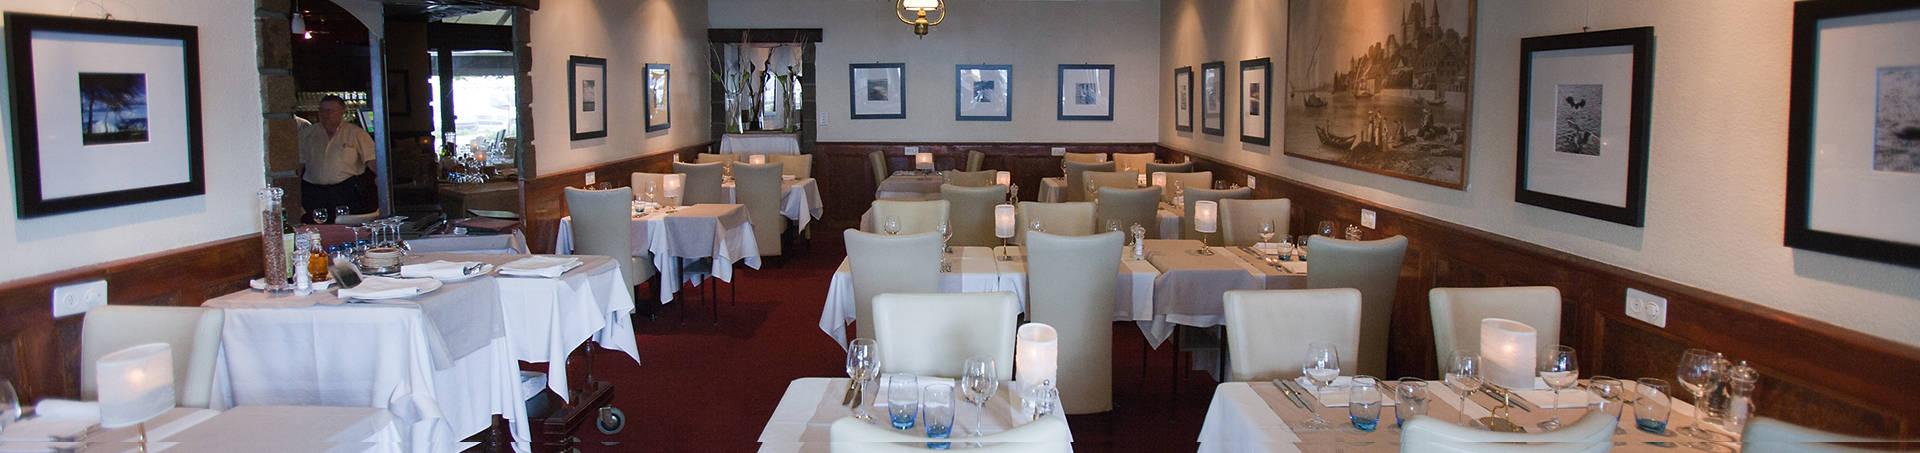 leman-3-restaurants-nyon